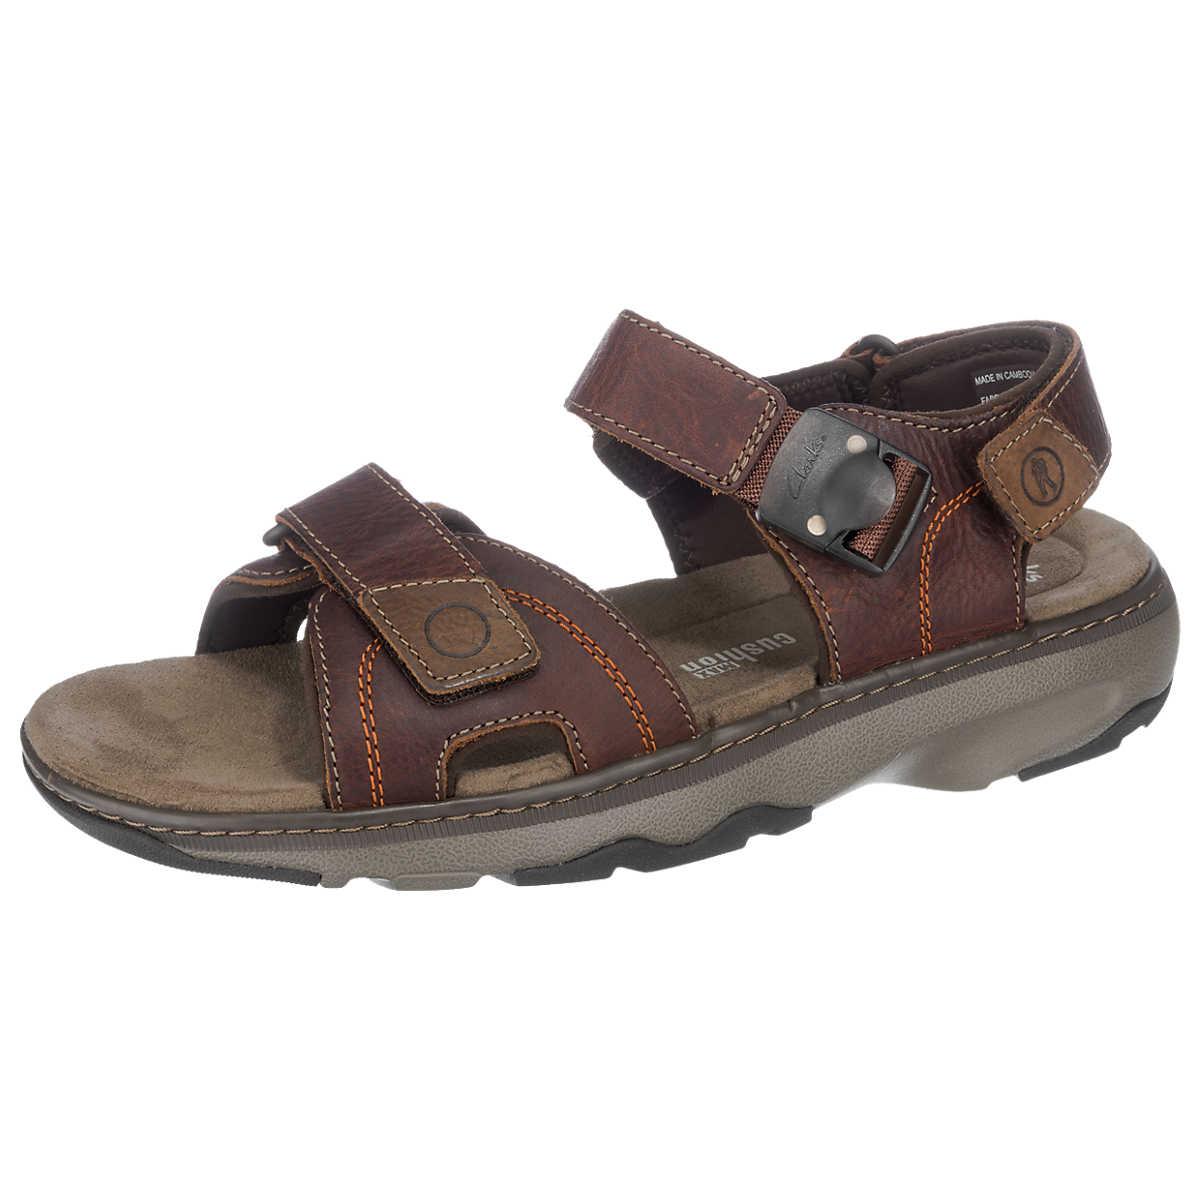 Clarks Raffe Sun Sandalen braun - Clarks - Sandalen - Schuhe - mirapodo.de